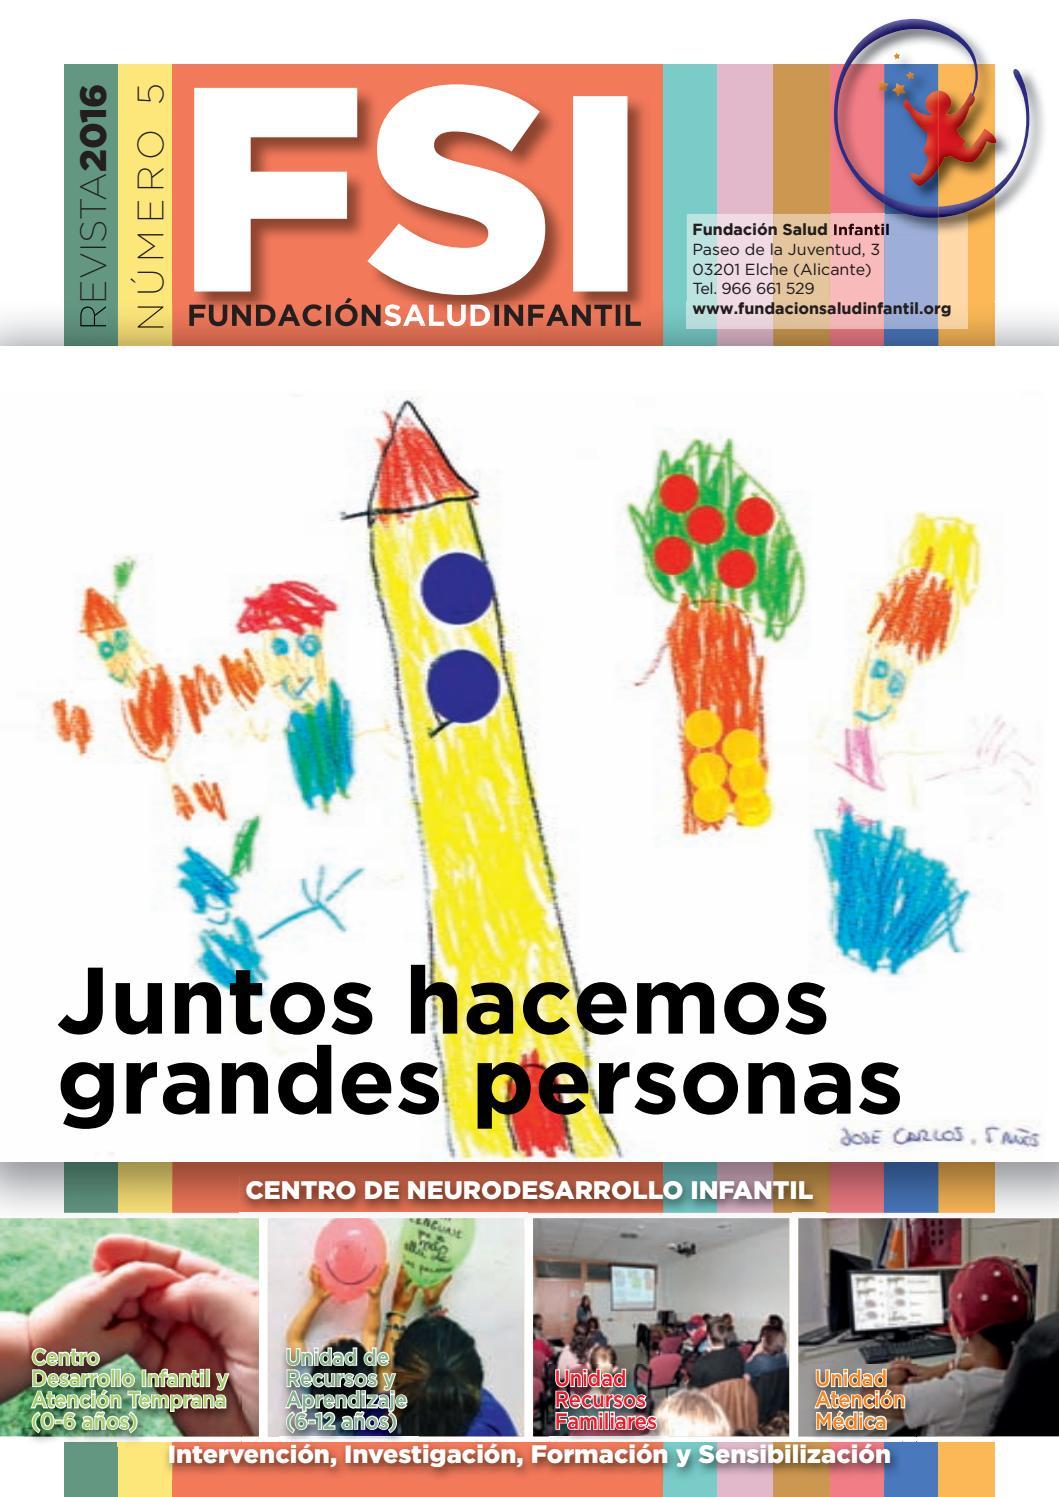 Revista 2017 by Fundación Salud Infantil - issuu